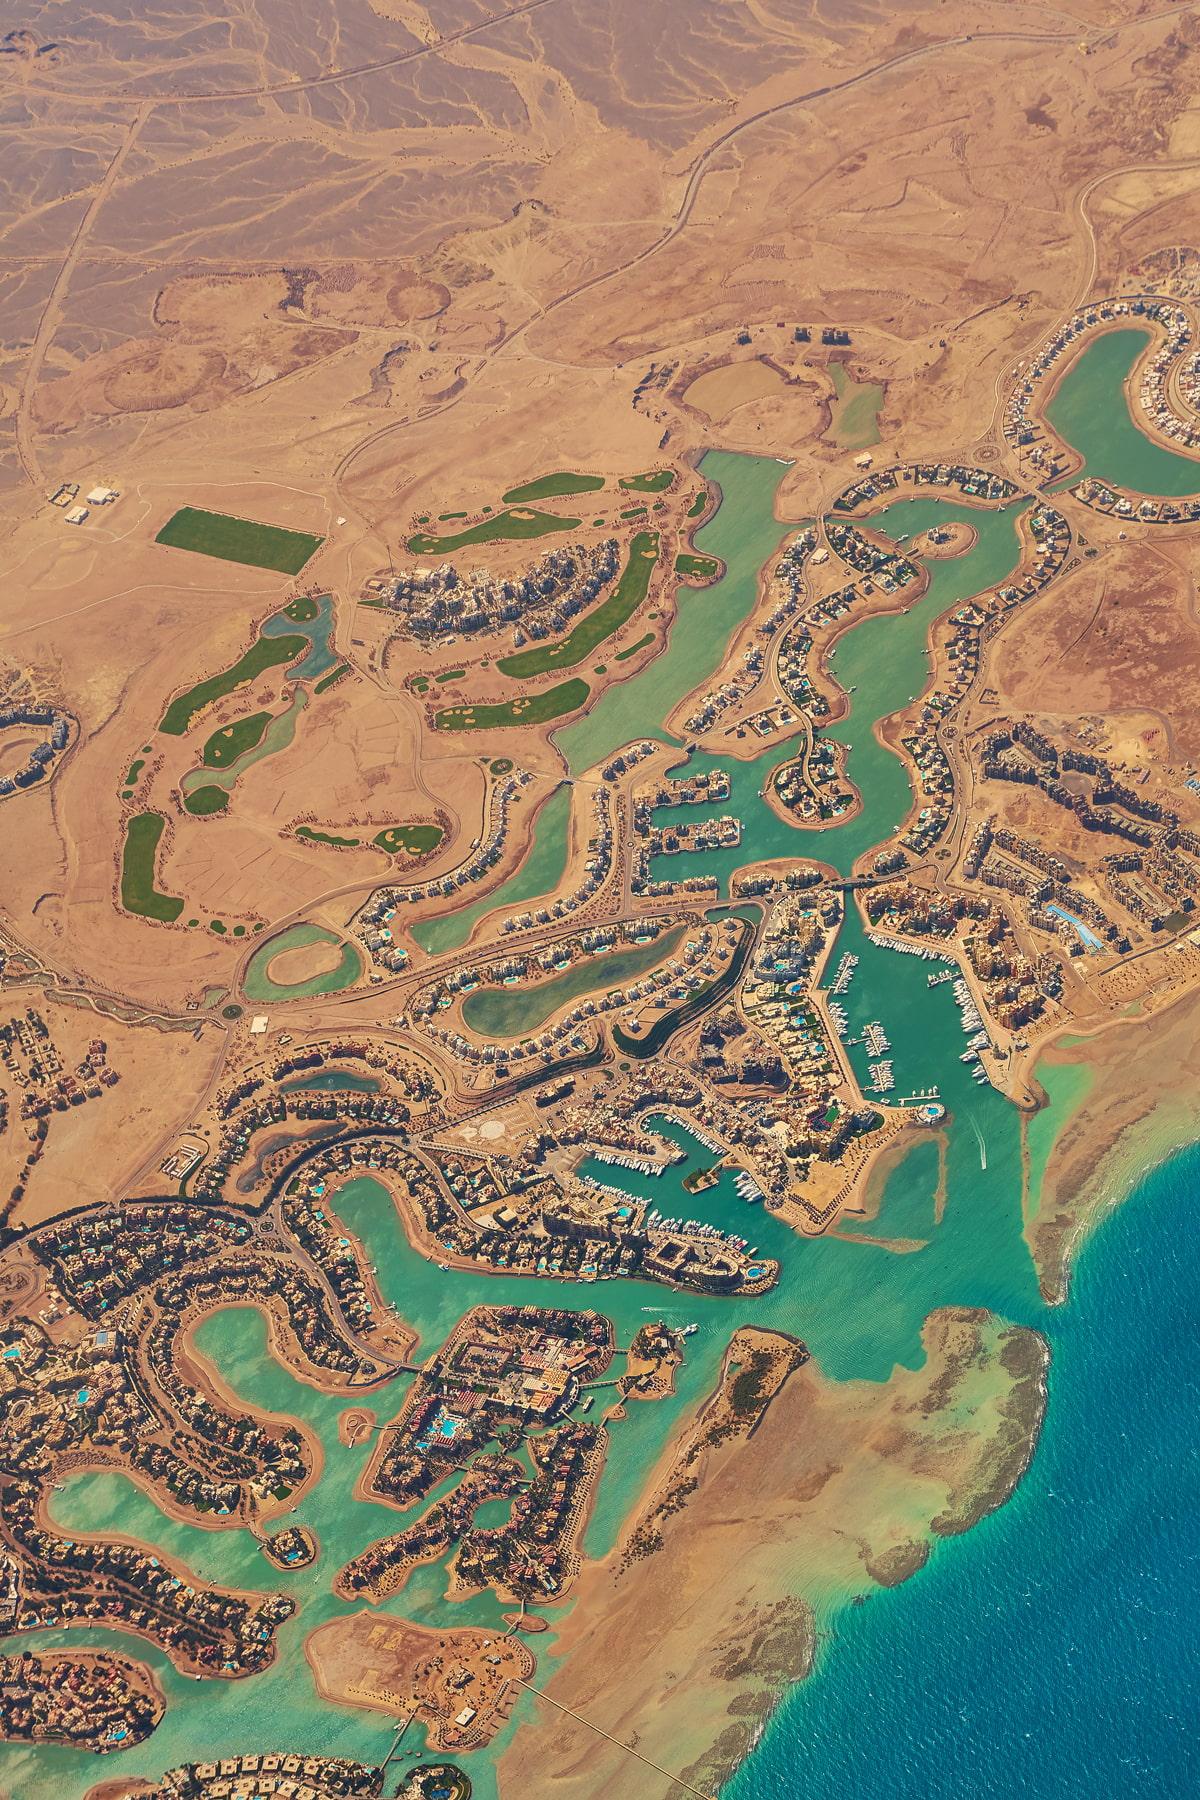 Beach city in Egypt